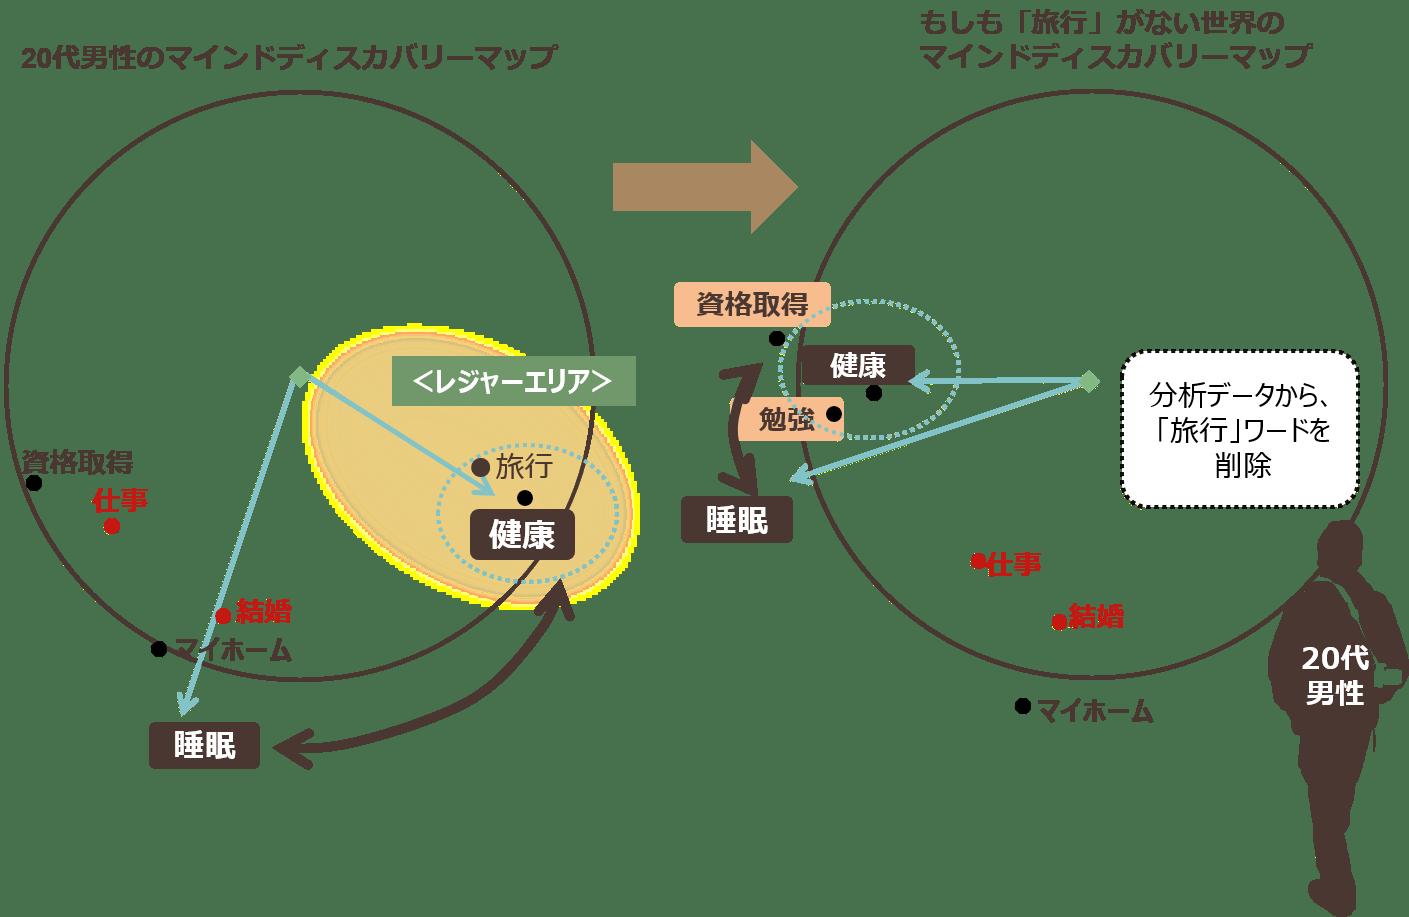 2020seikatsusha5_03.png